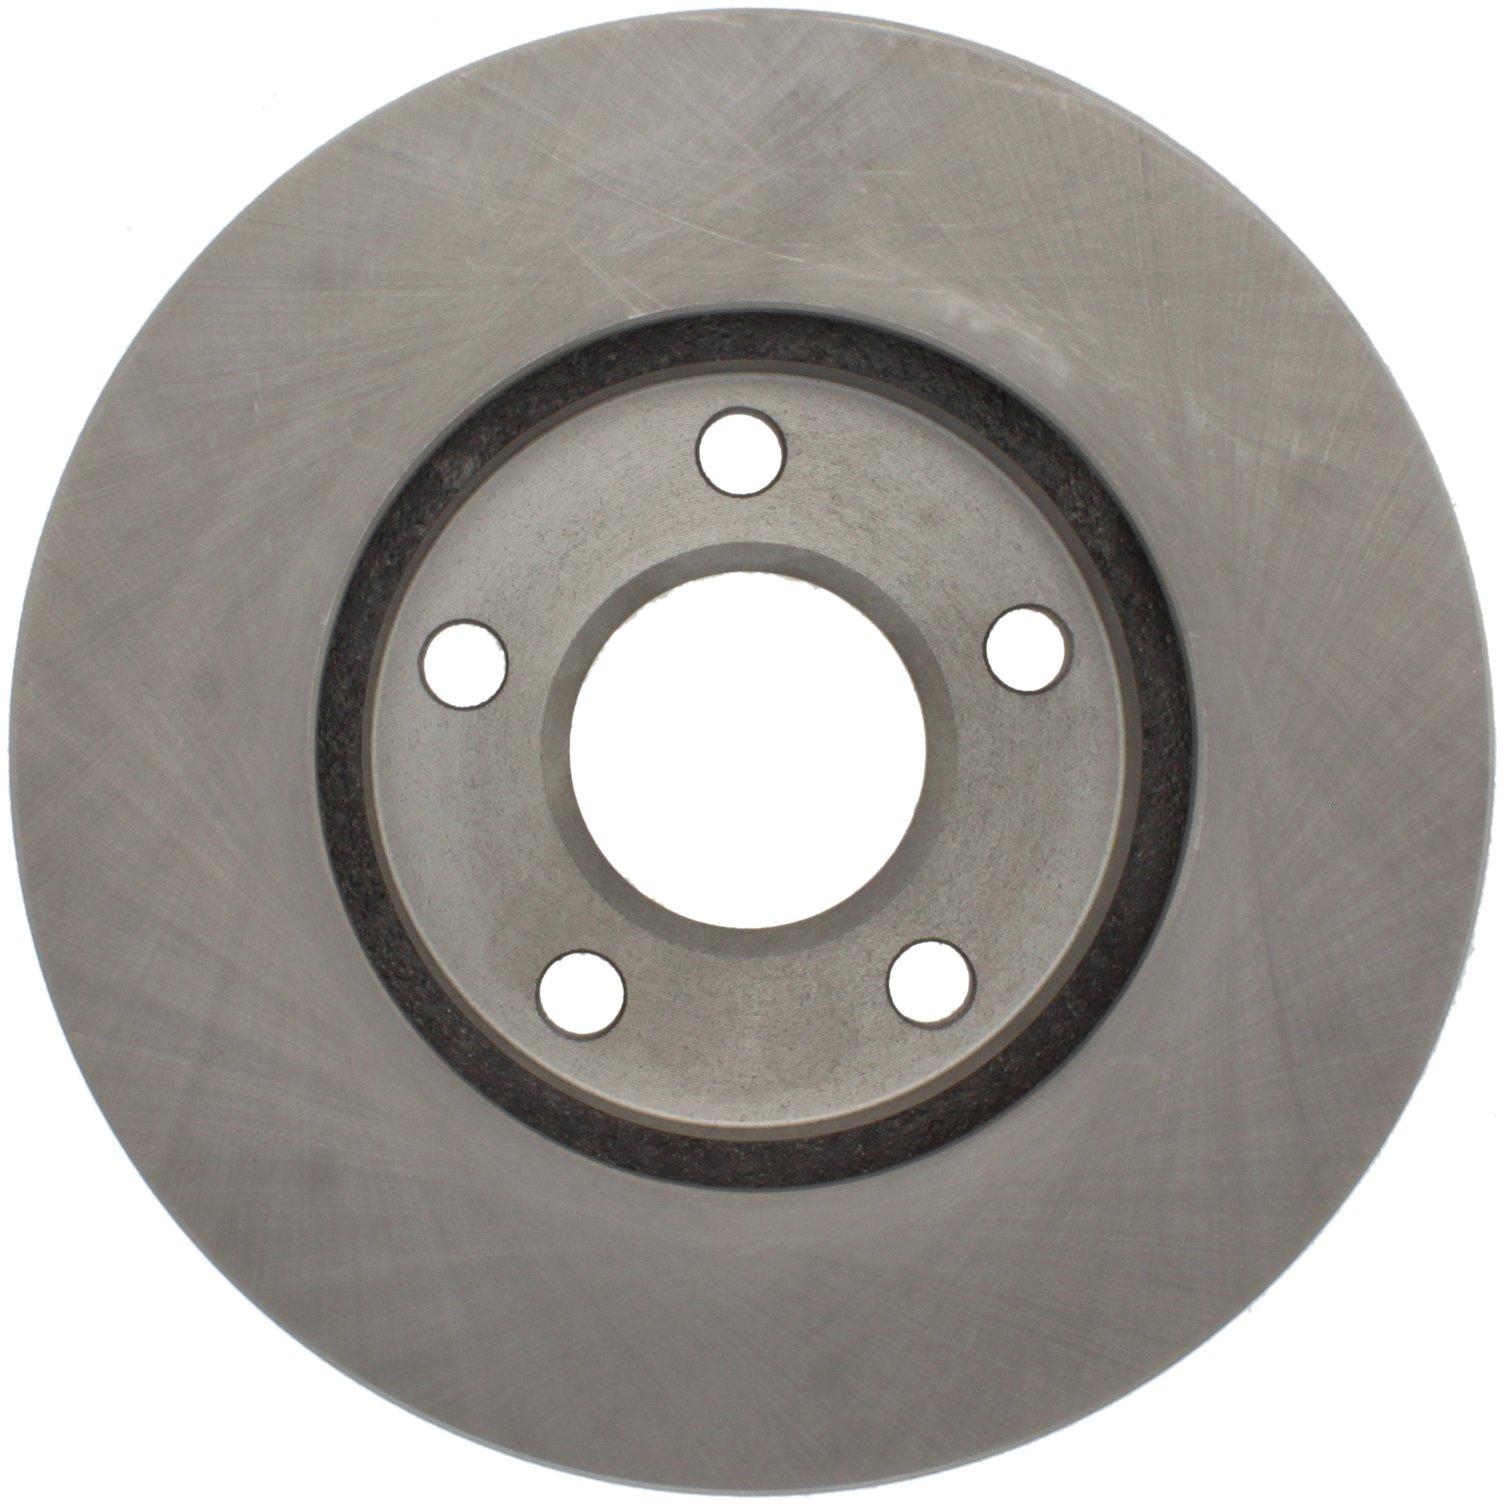 Wheelmate 32906O Muteki SR48 Open End Lug Nut Orange 12 x 1.50 48mm